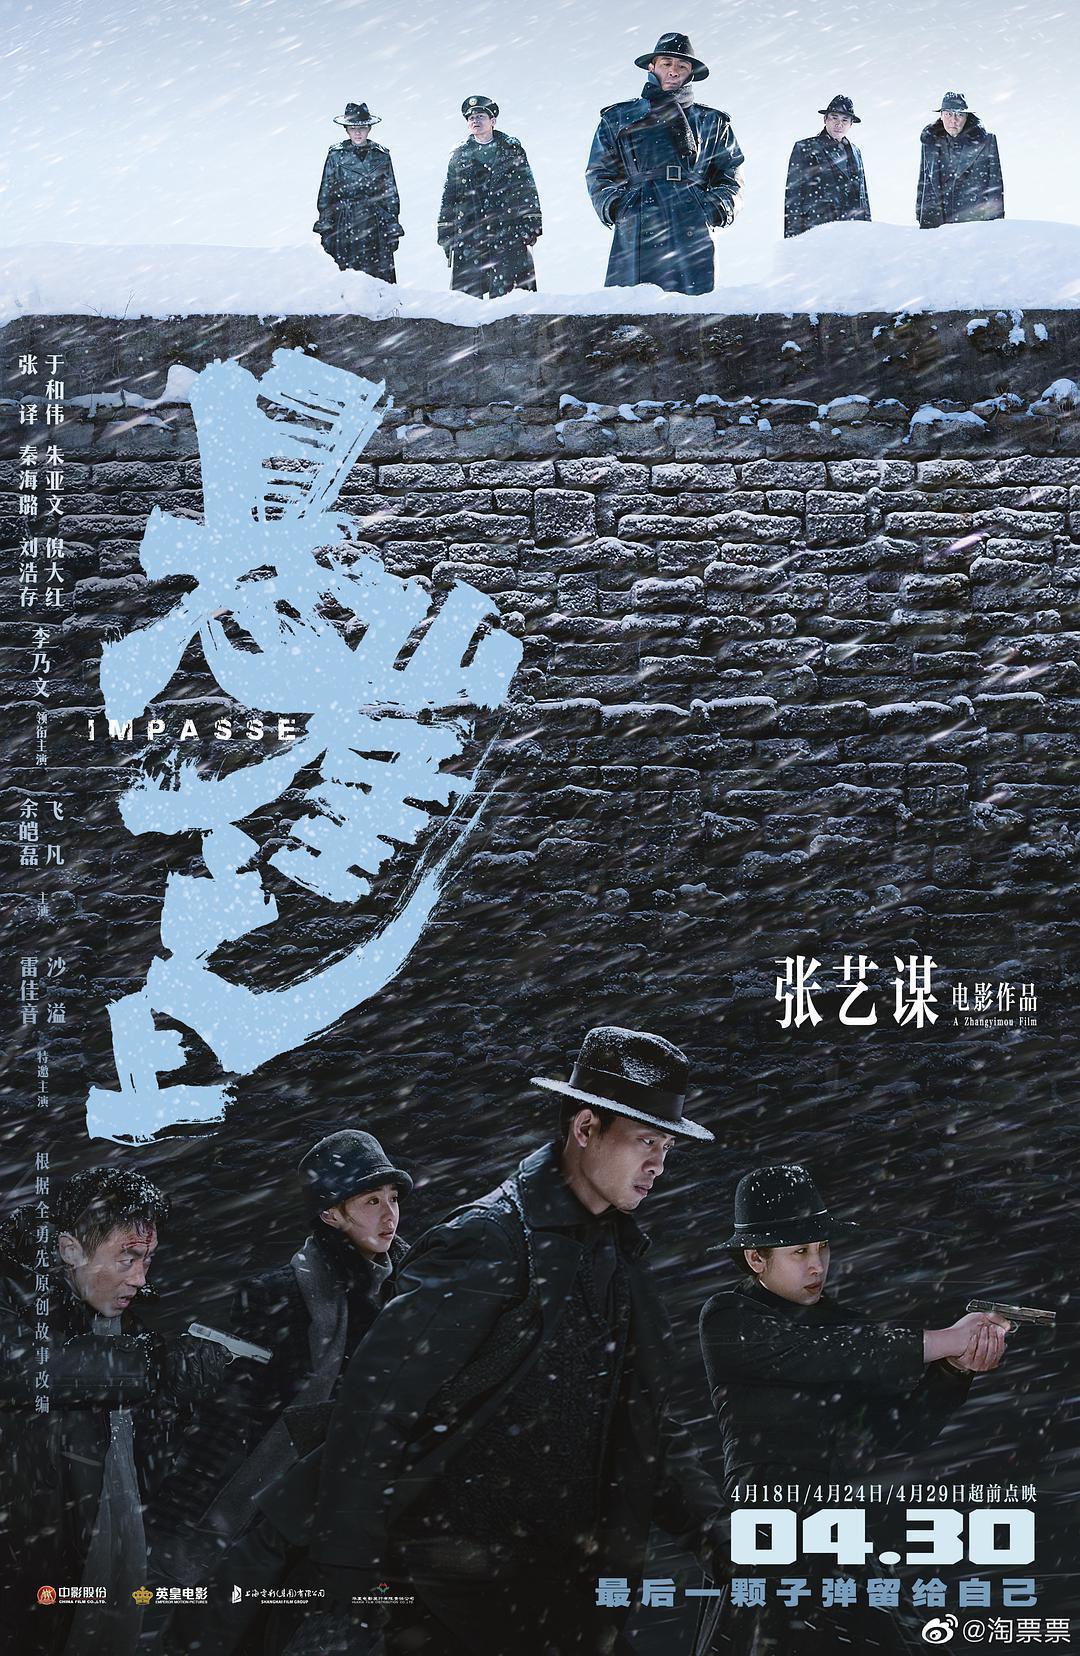 Photo:Sina Weibo